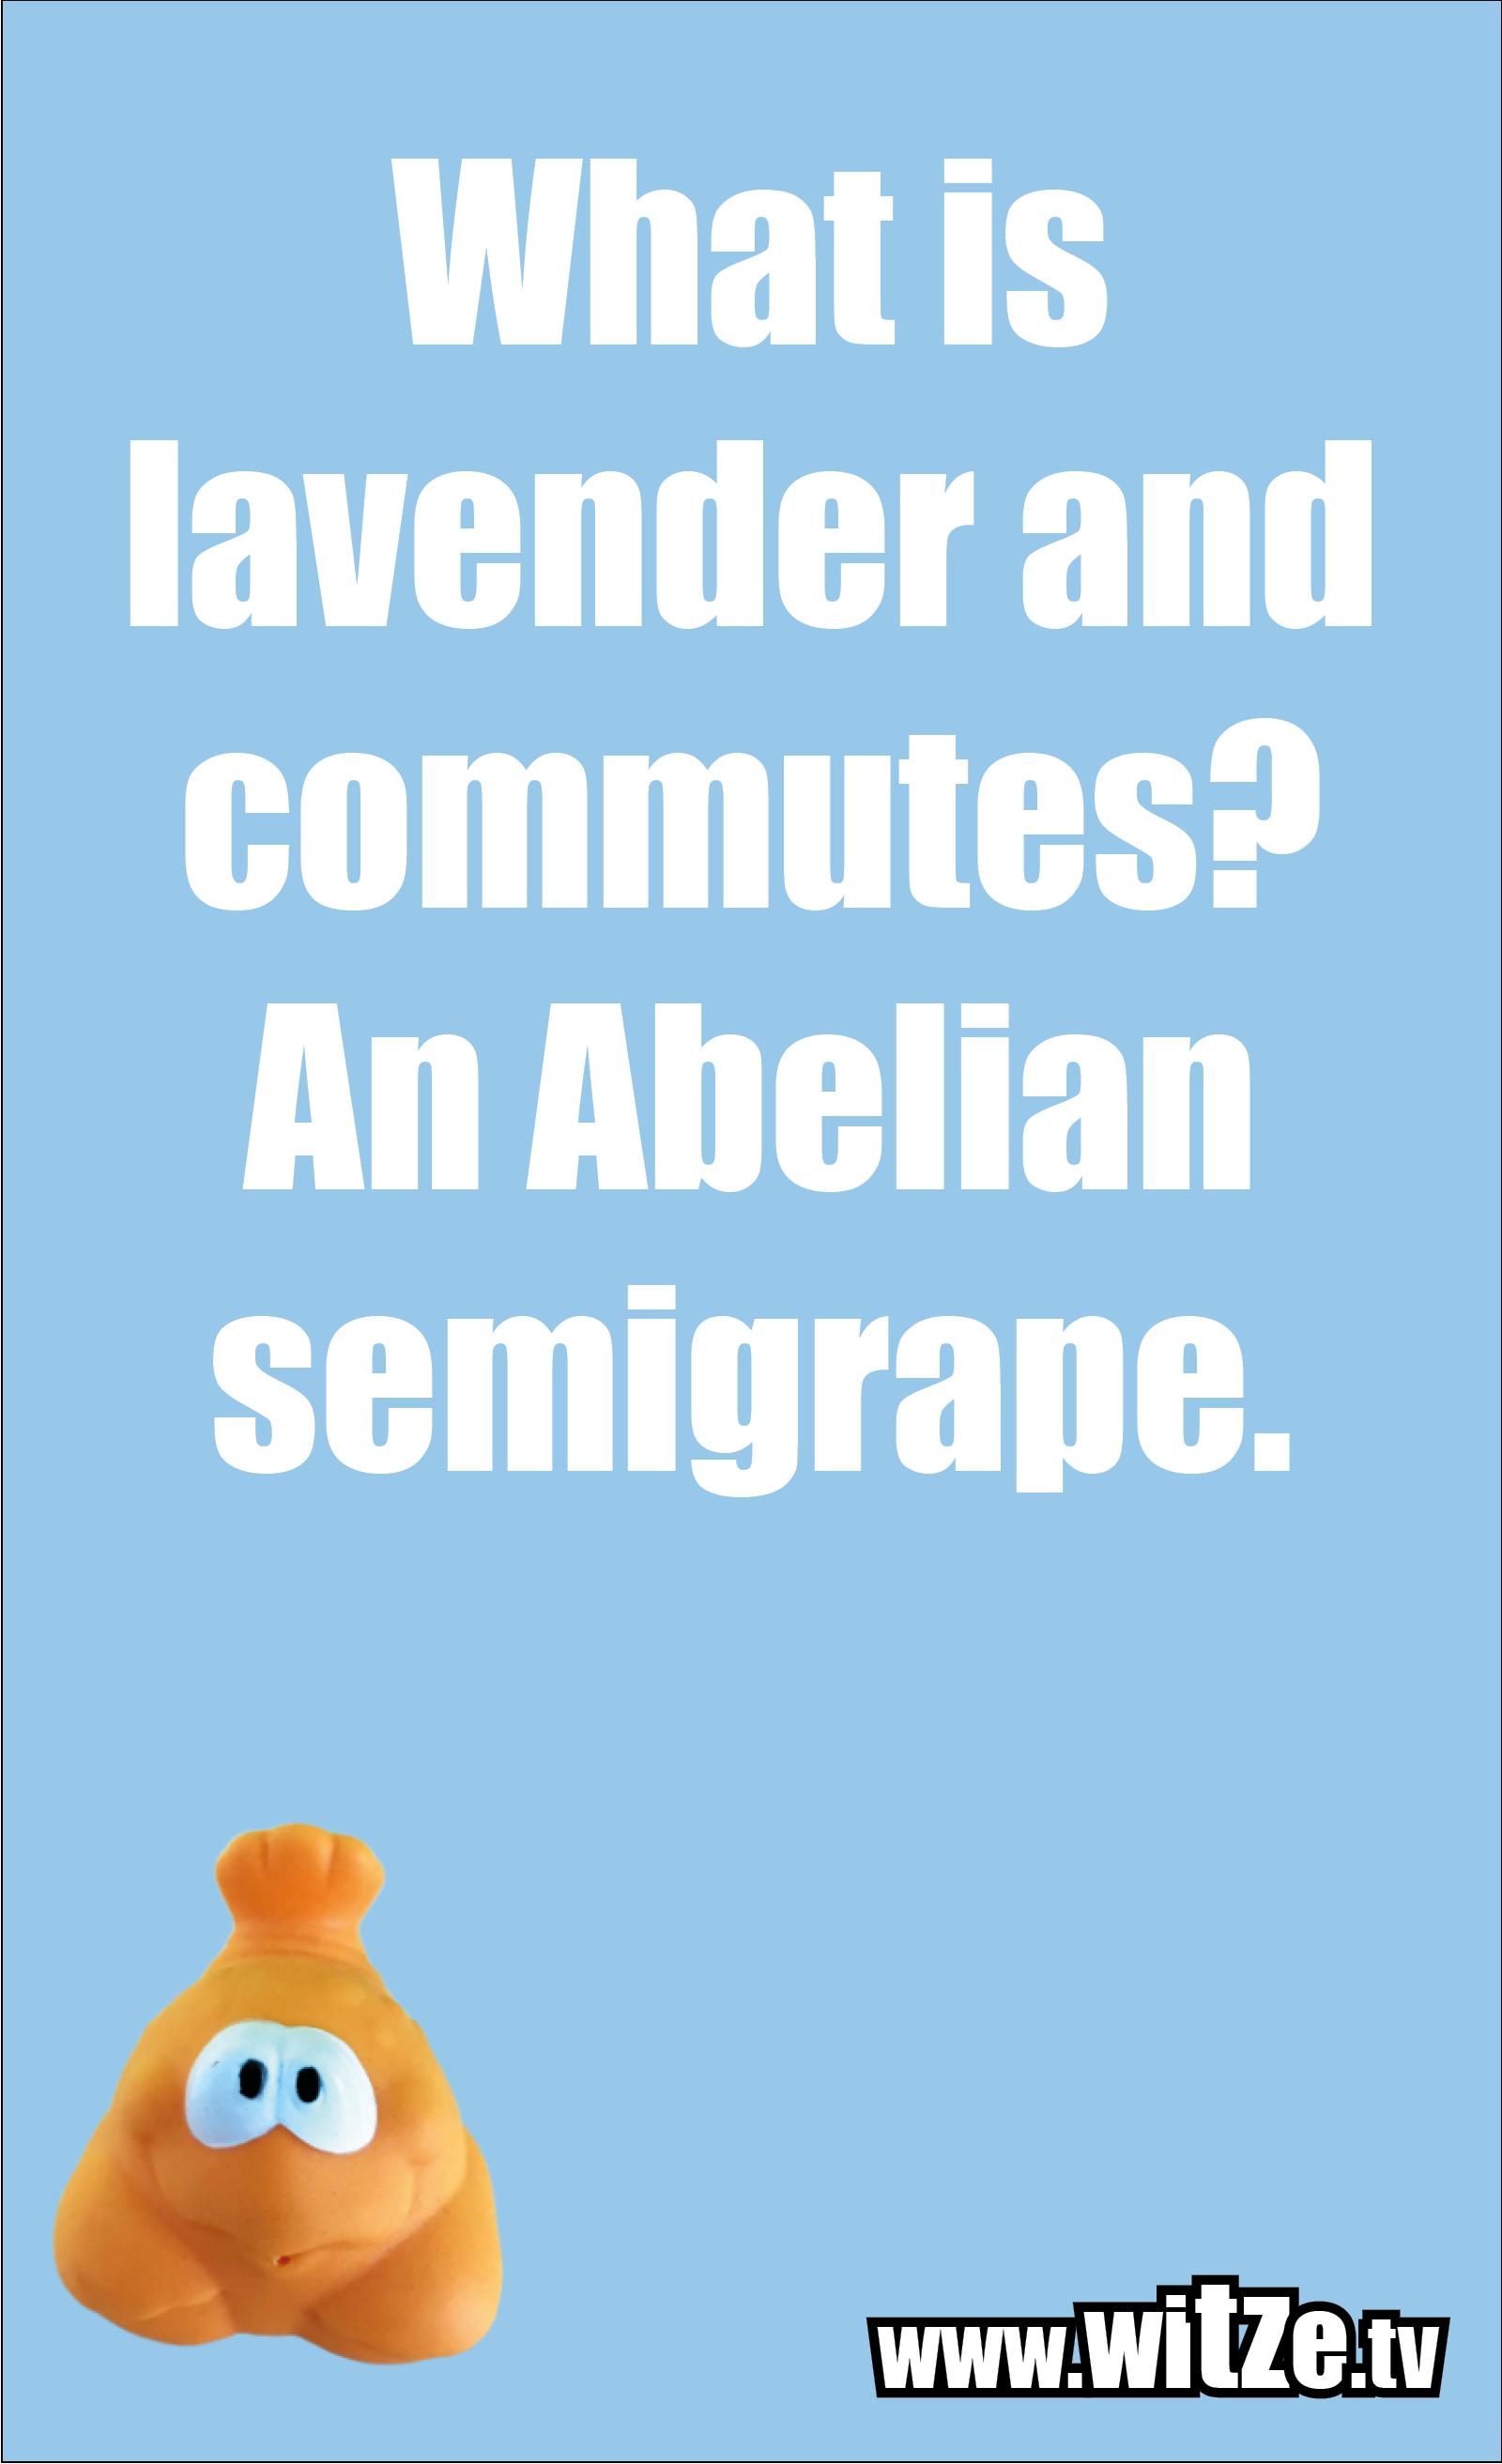 Math joke… What is lavender and commutes? An Abelian semigrape.